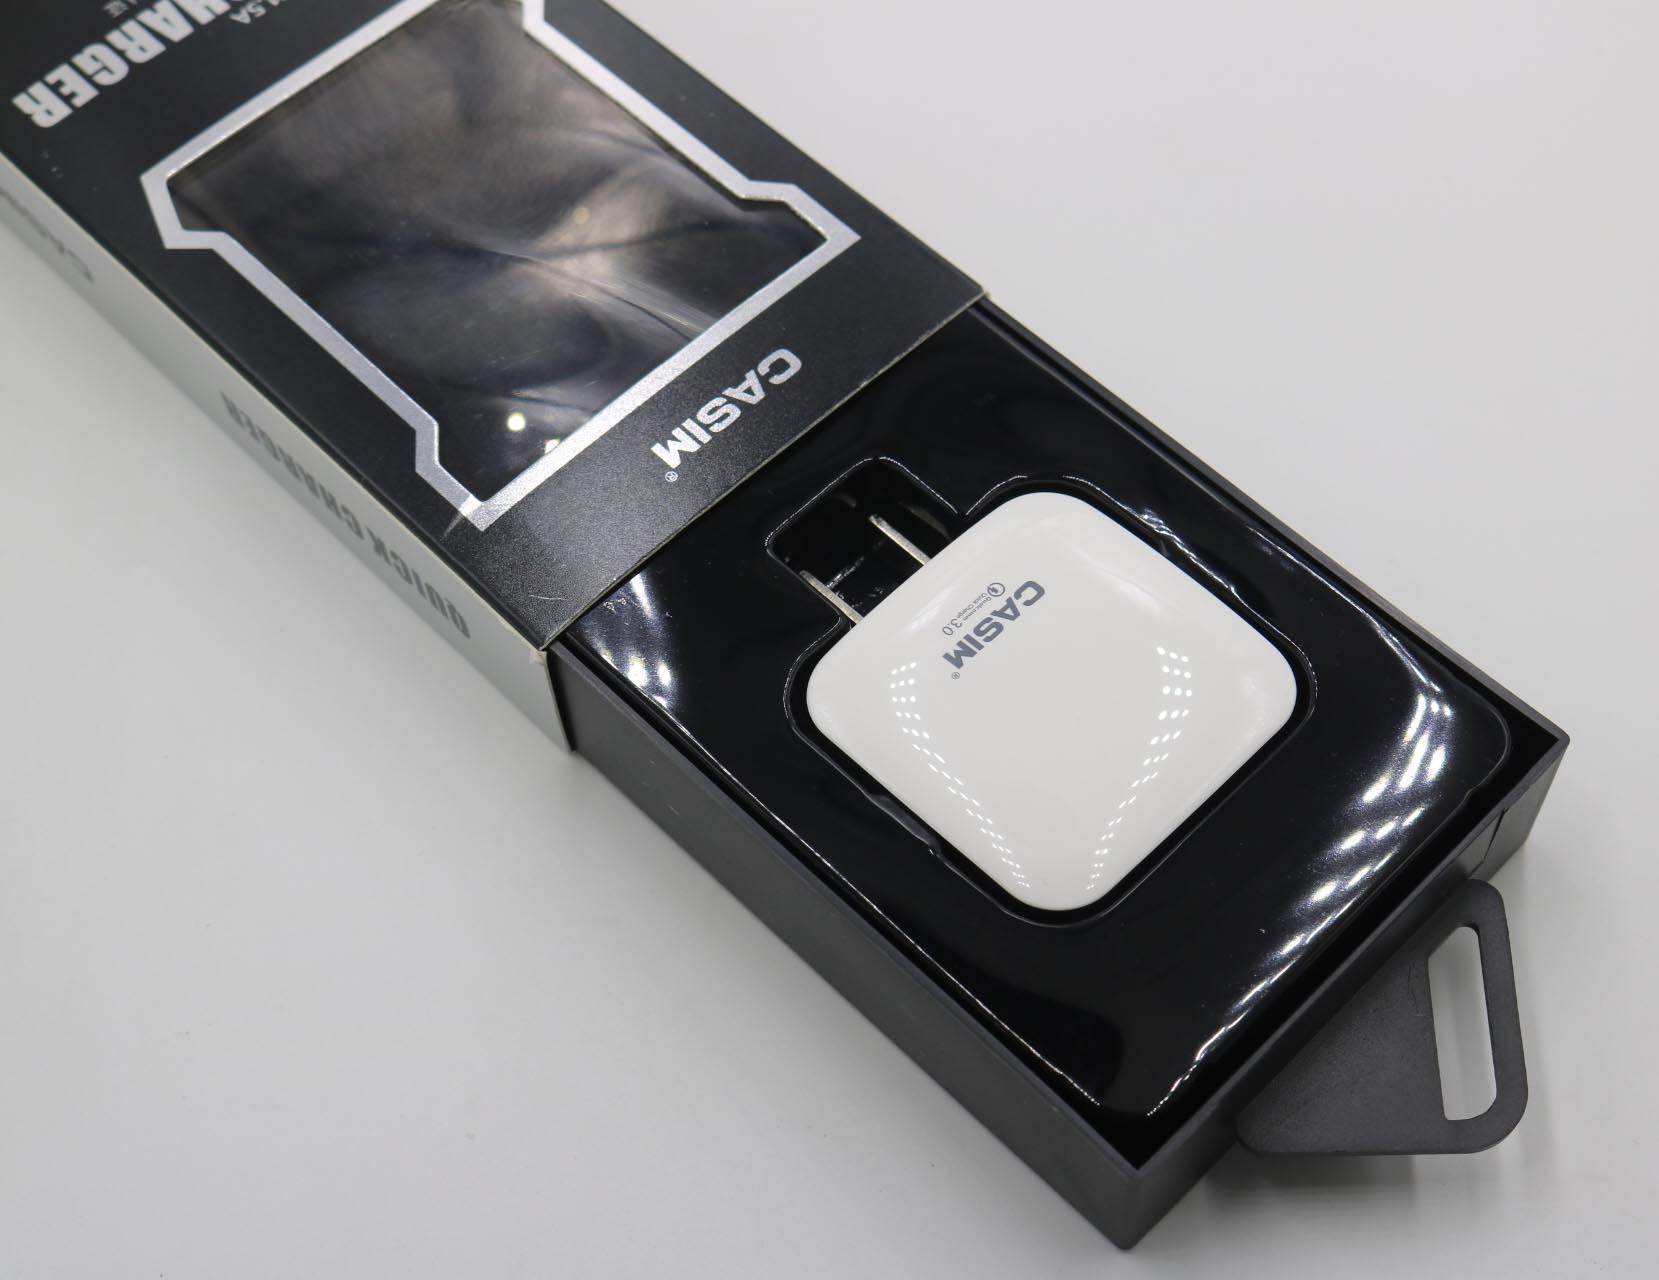 CASIM Hızlı Şarj Adaptörü Için Süper hızlı Şarj iphone6 artı 4 5 6 S 7 AC 100 V-240 V 50/60 HZ, DC 12 V-1.5A max